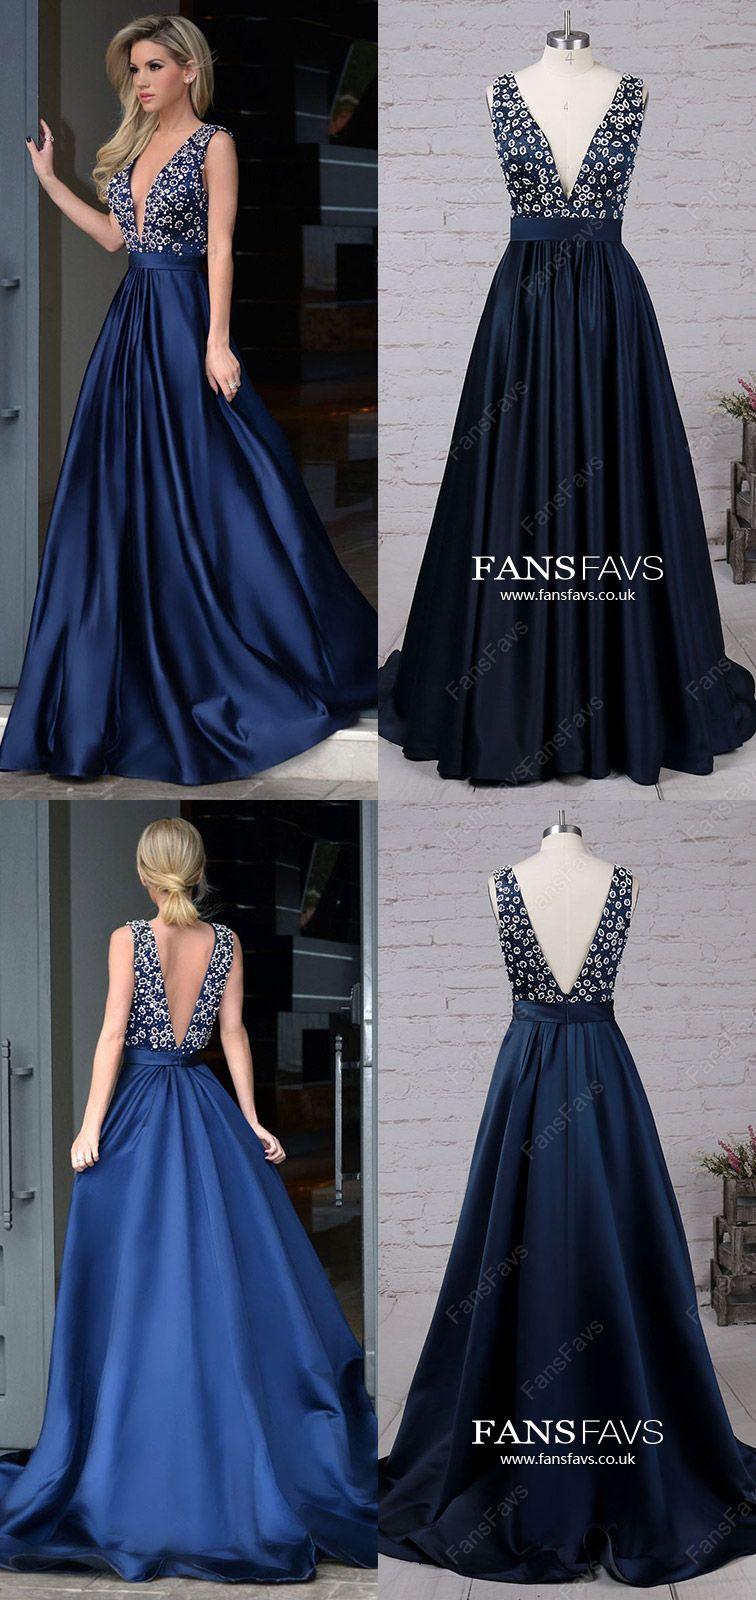 Long prom dresses for teensroyal blue prom dressesaline prom